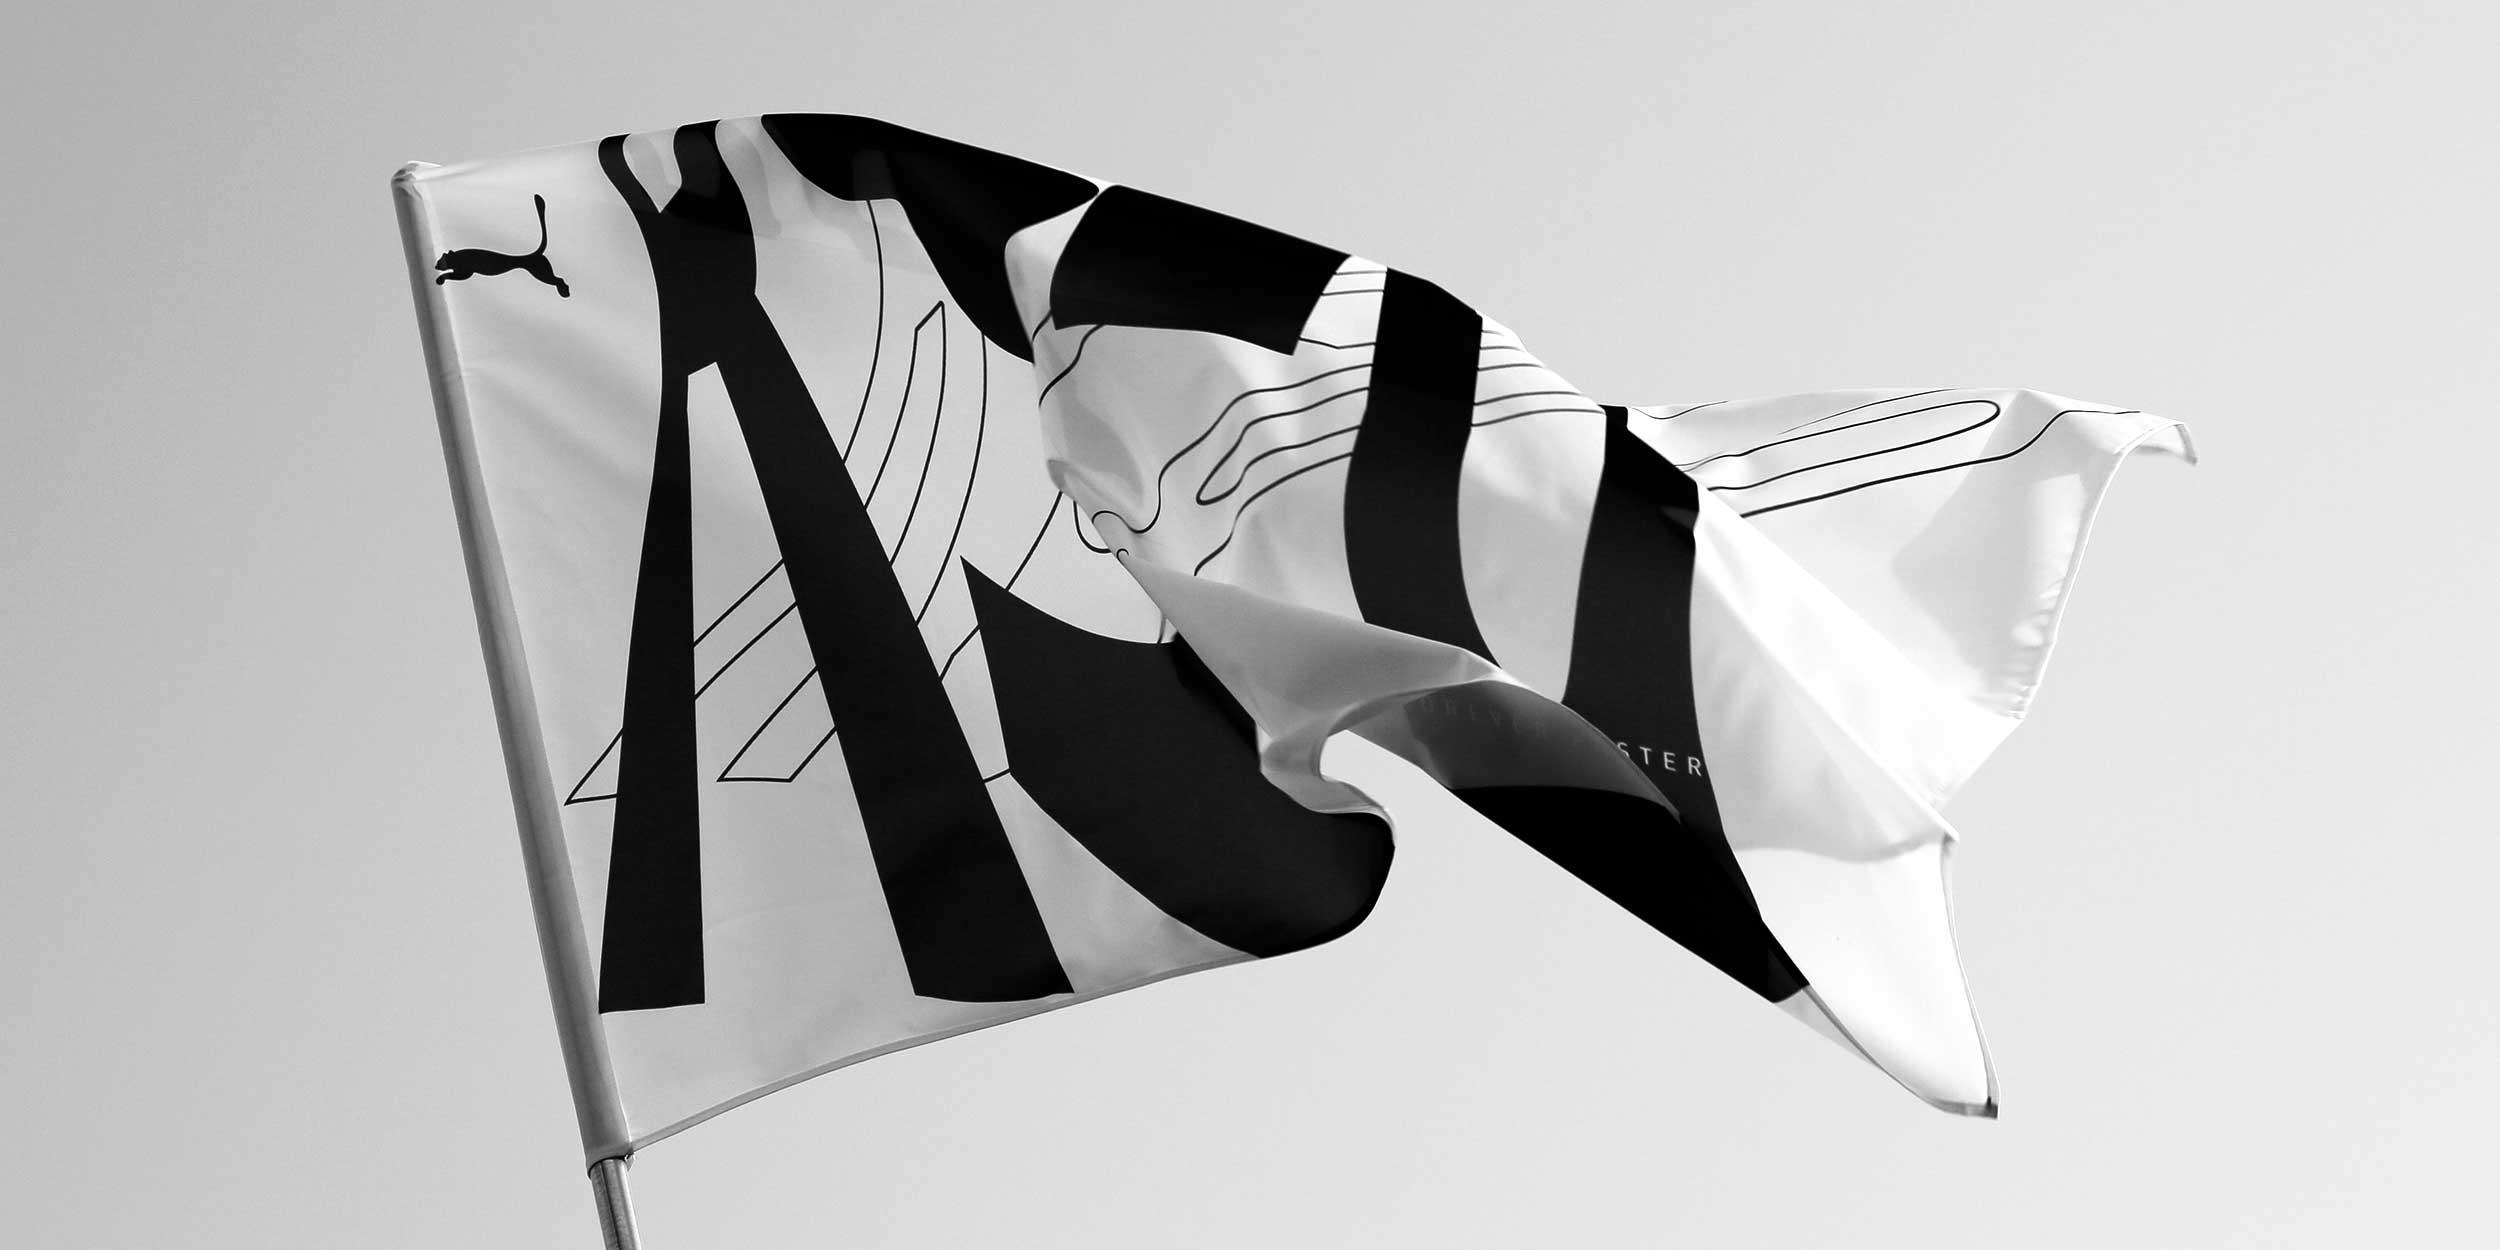 RS0_Concept_02_Fahne_006